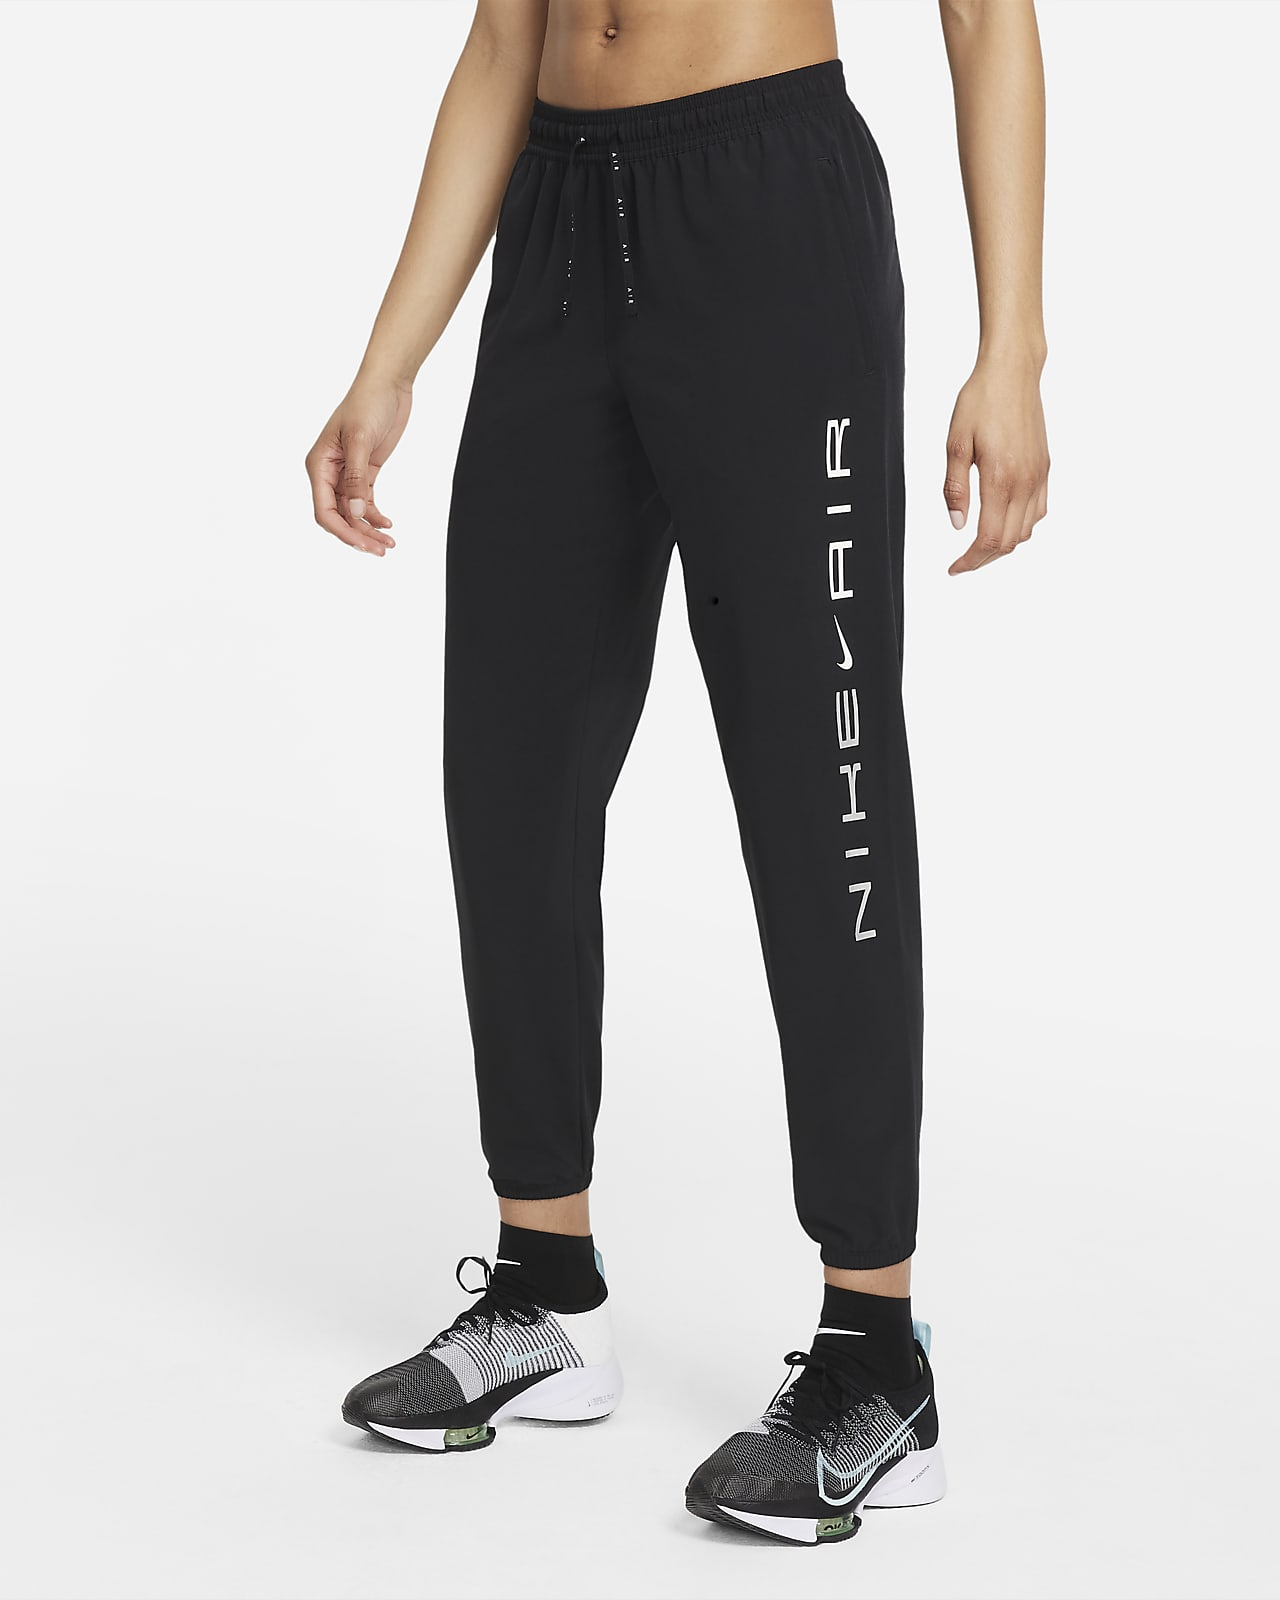 Nike Air Dri-FIT női futónadrág